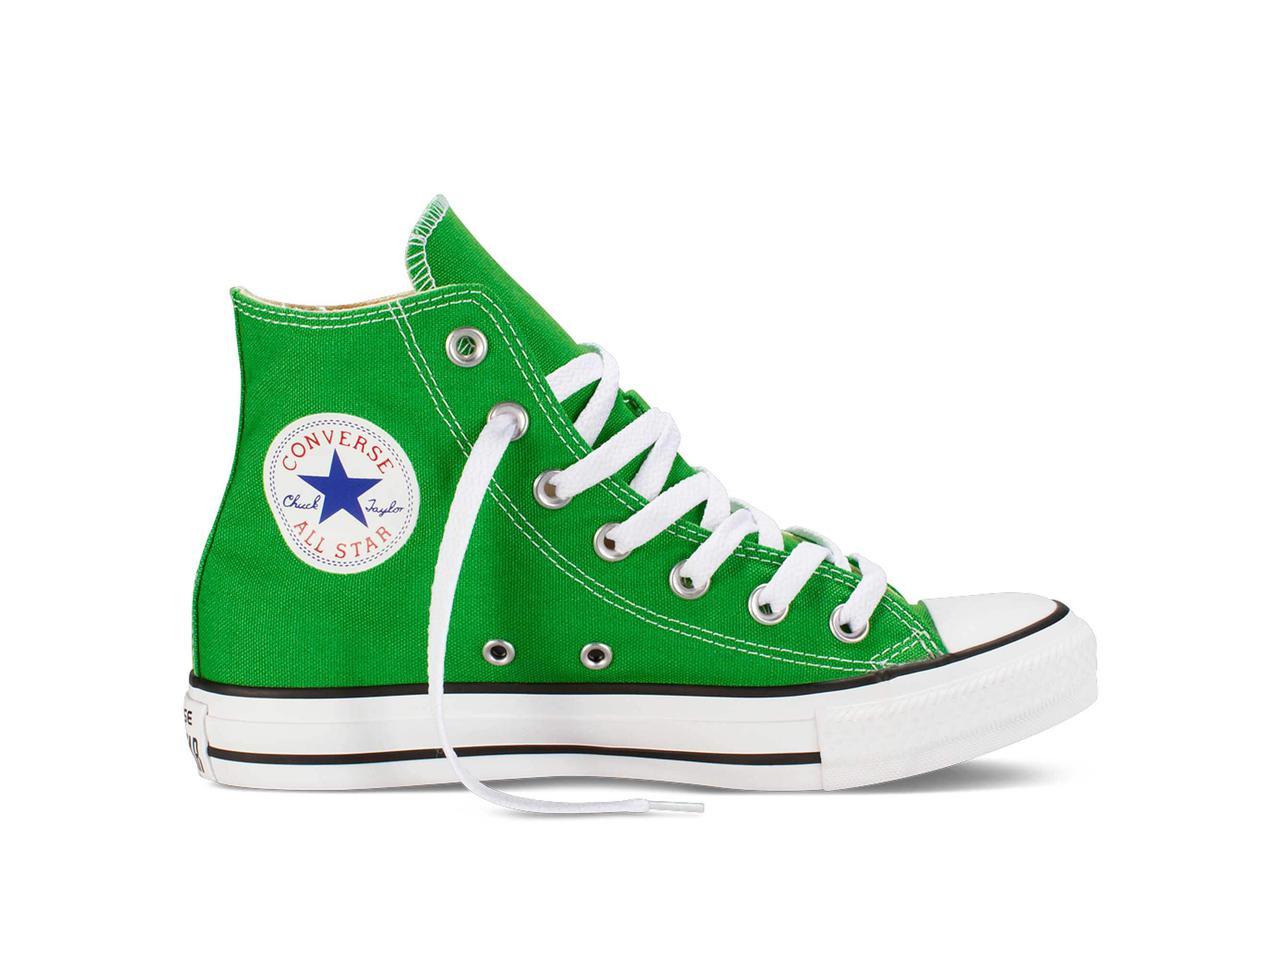 Кеды Converse All Star High зеленого цвета